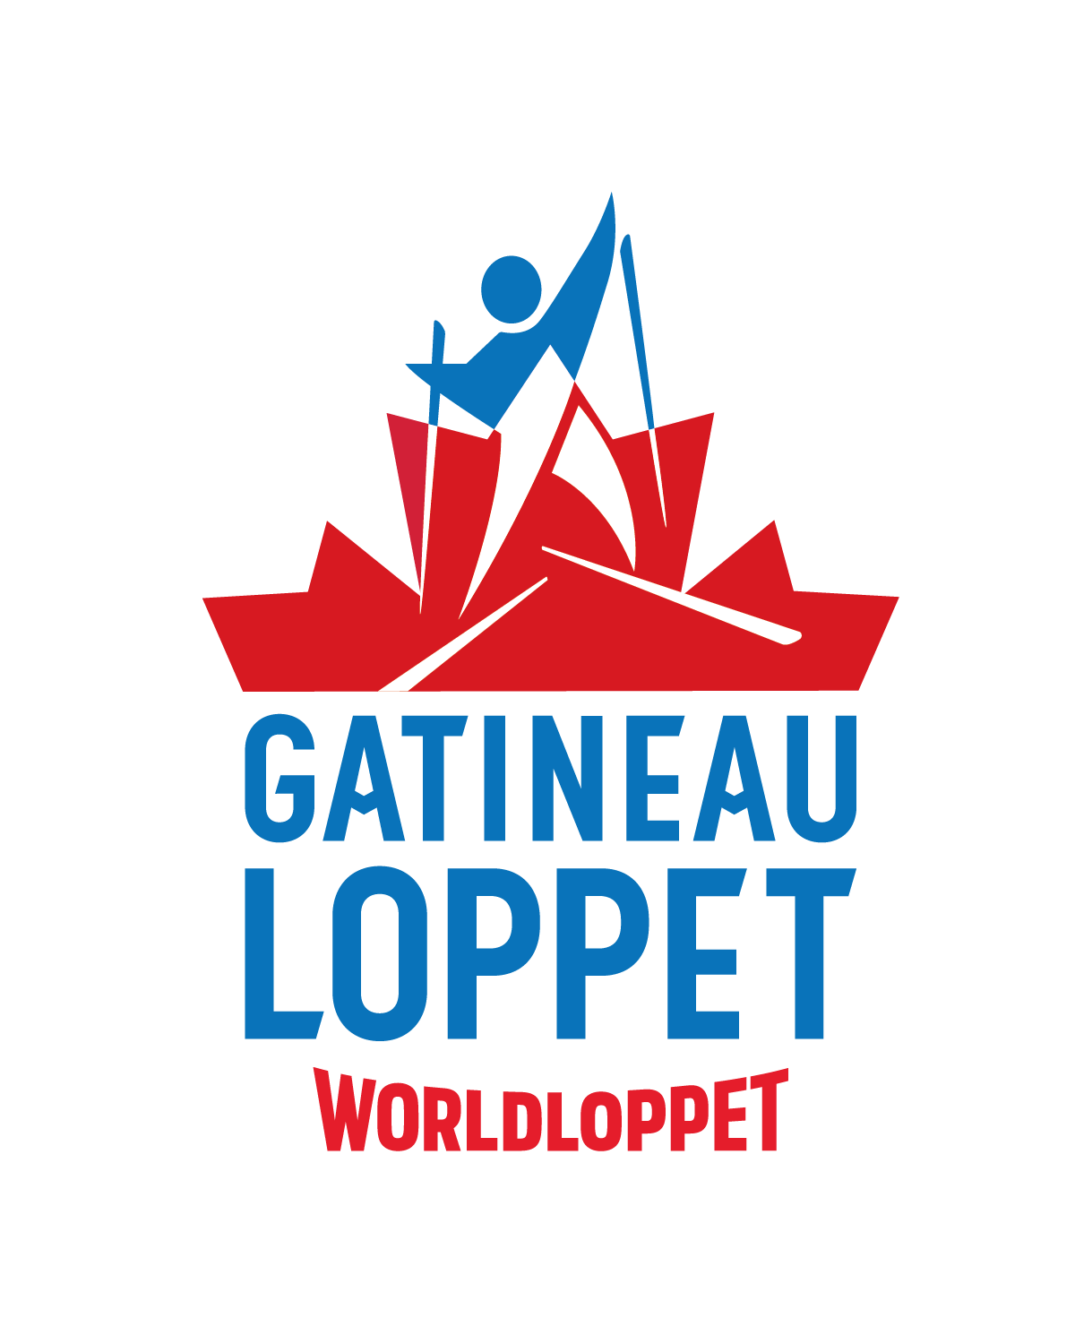 Gatineau Loppet Logo 01